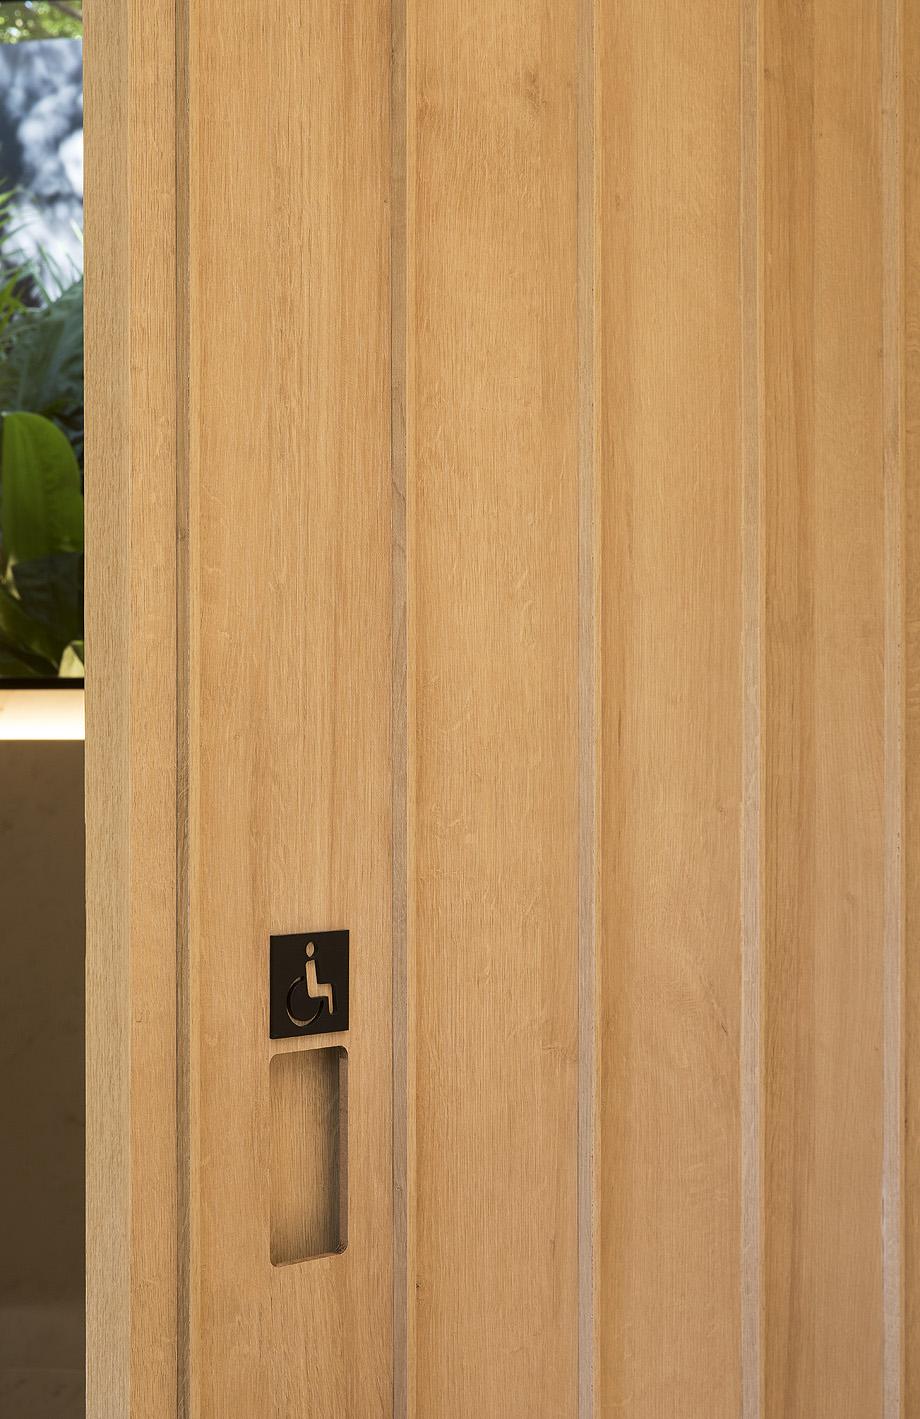 recinto do bosque de gdl arquitectura - foto felipe araujo (9)